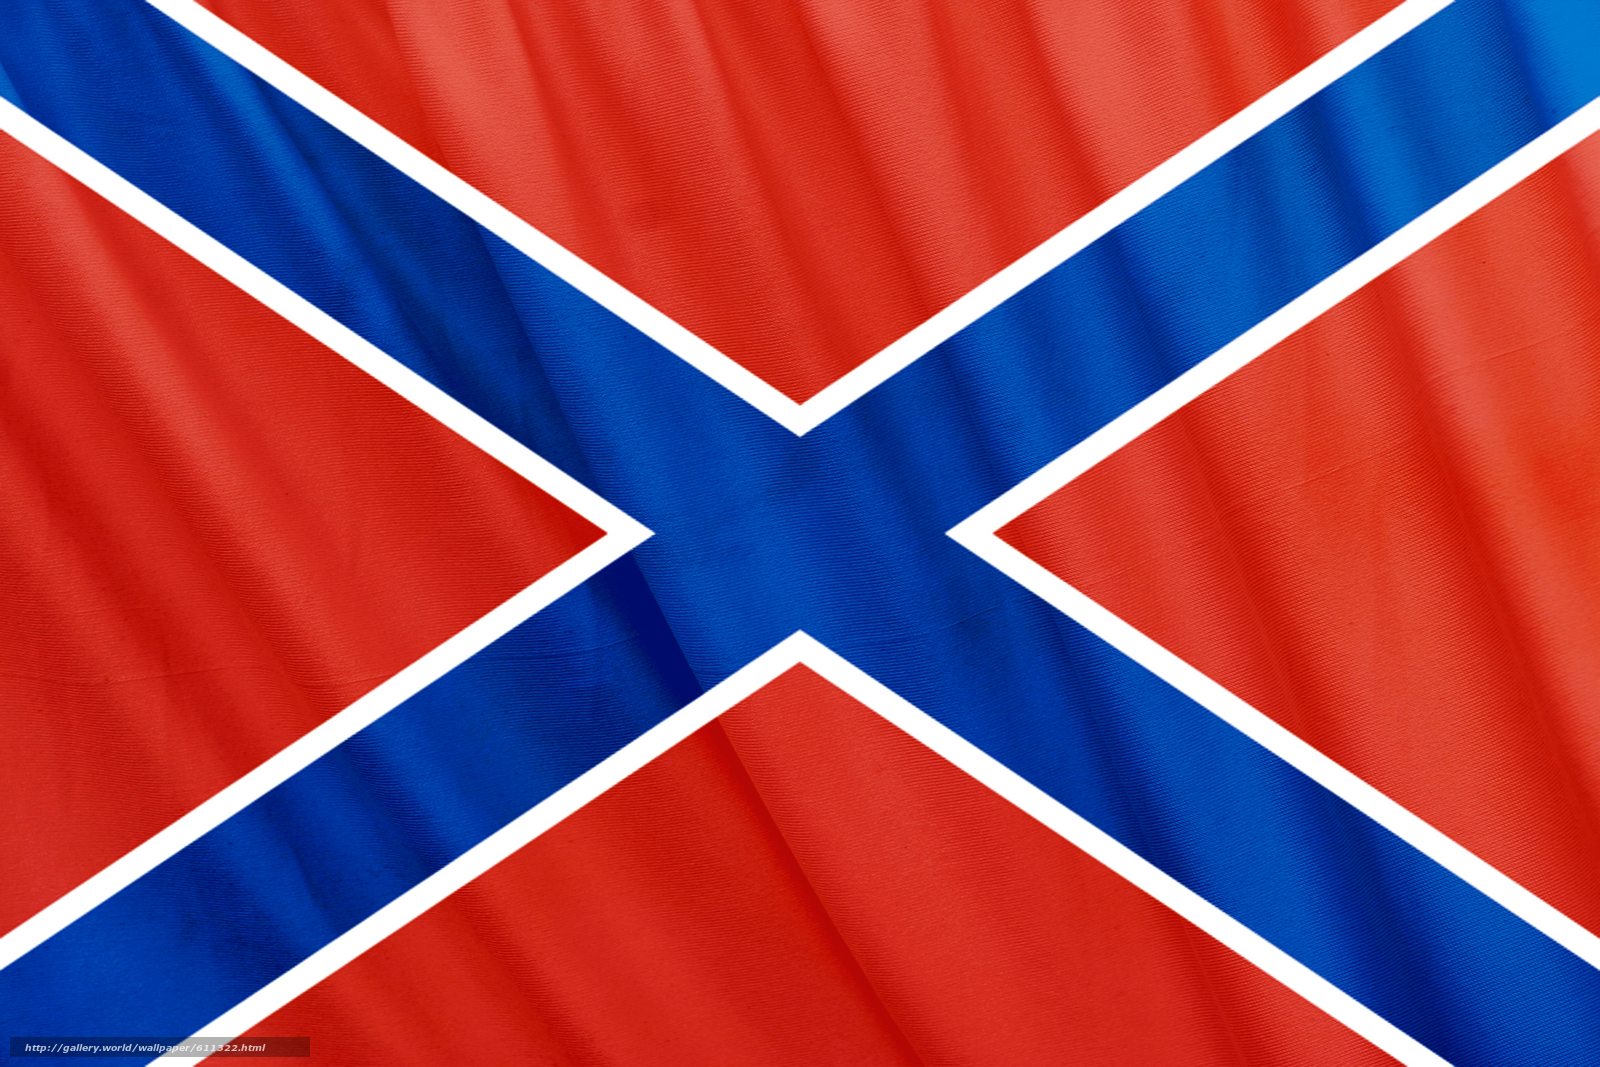 Download wallpaper Novorossia,  flag,  Donetsk,  Lugansk free desktop wallpaper in the resolution 1920x1280 — picture №611322